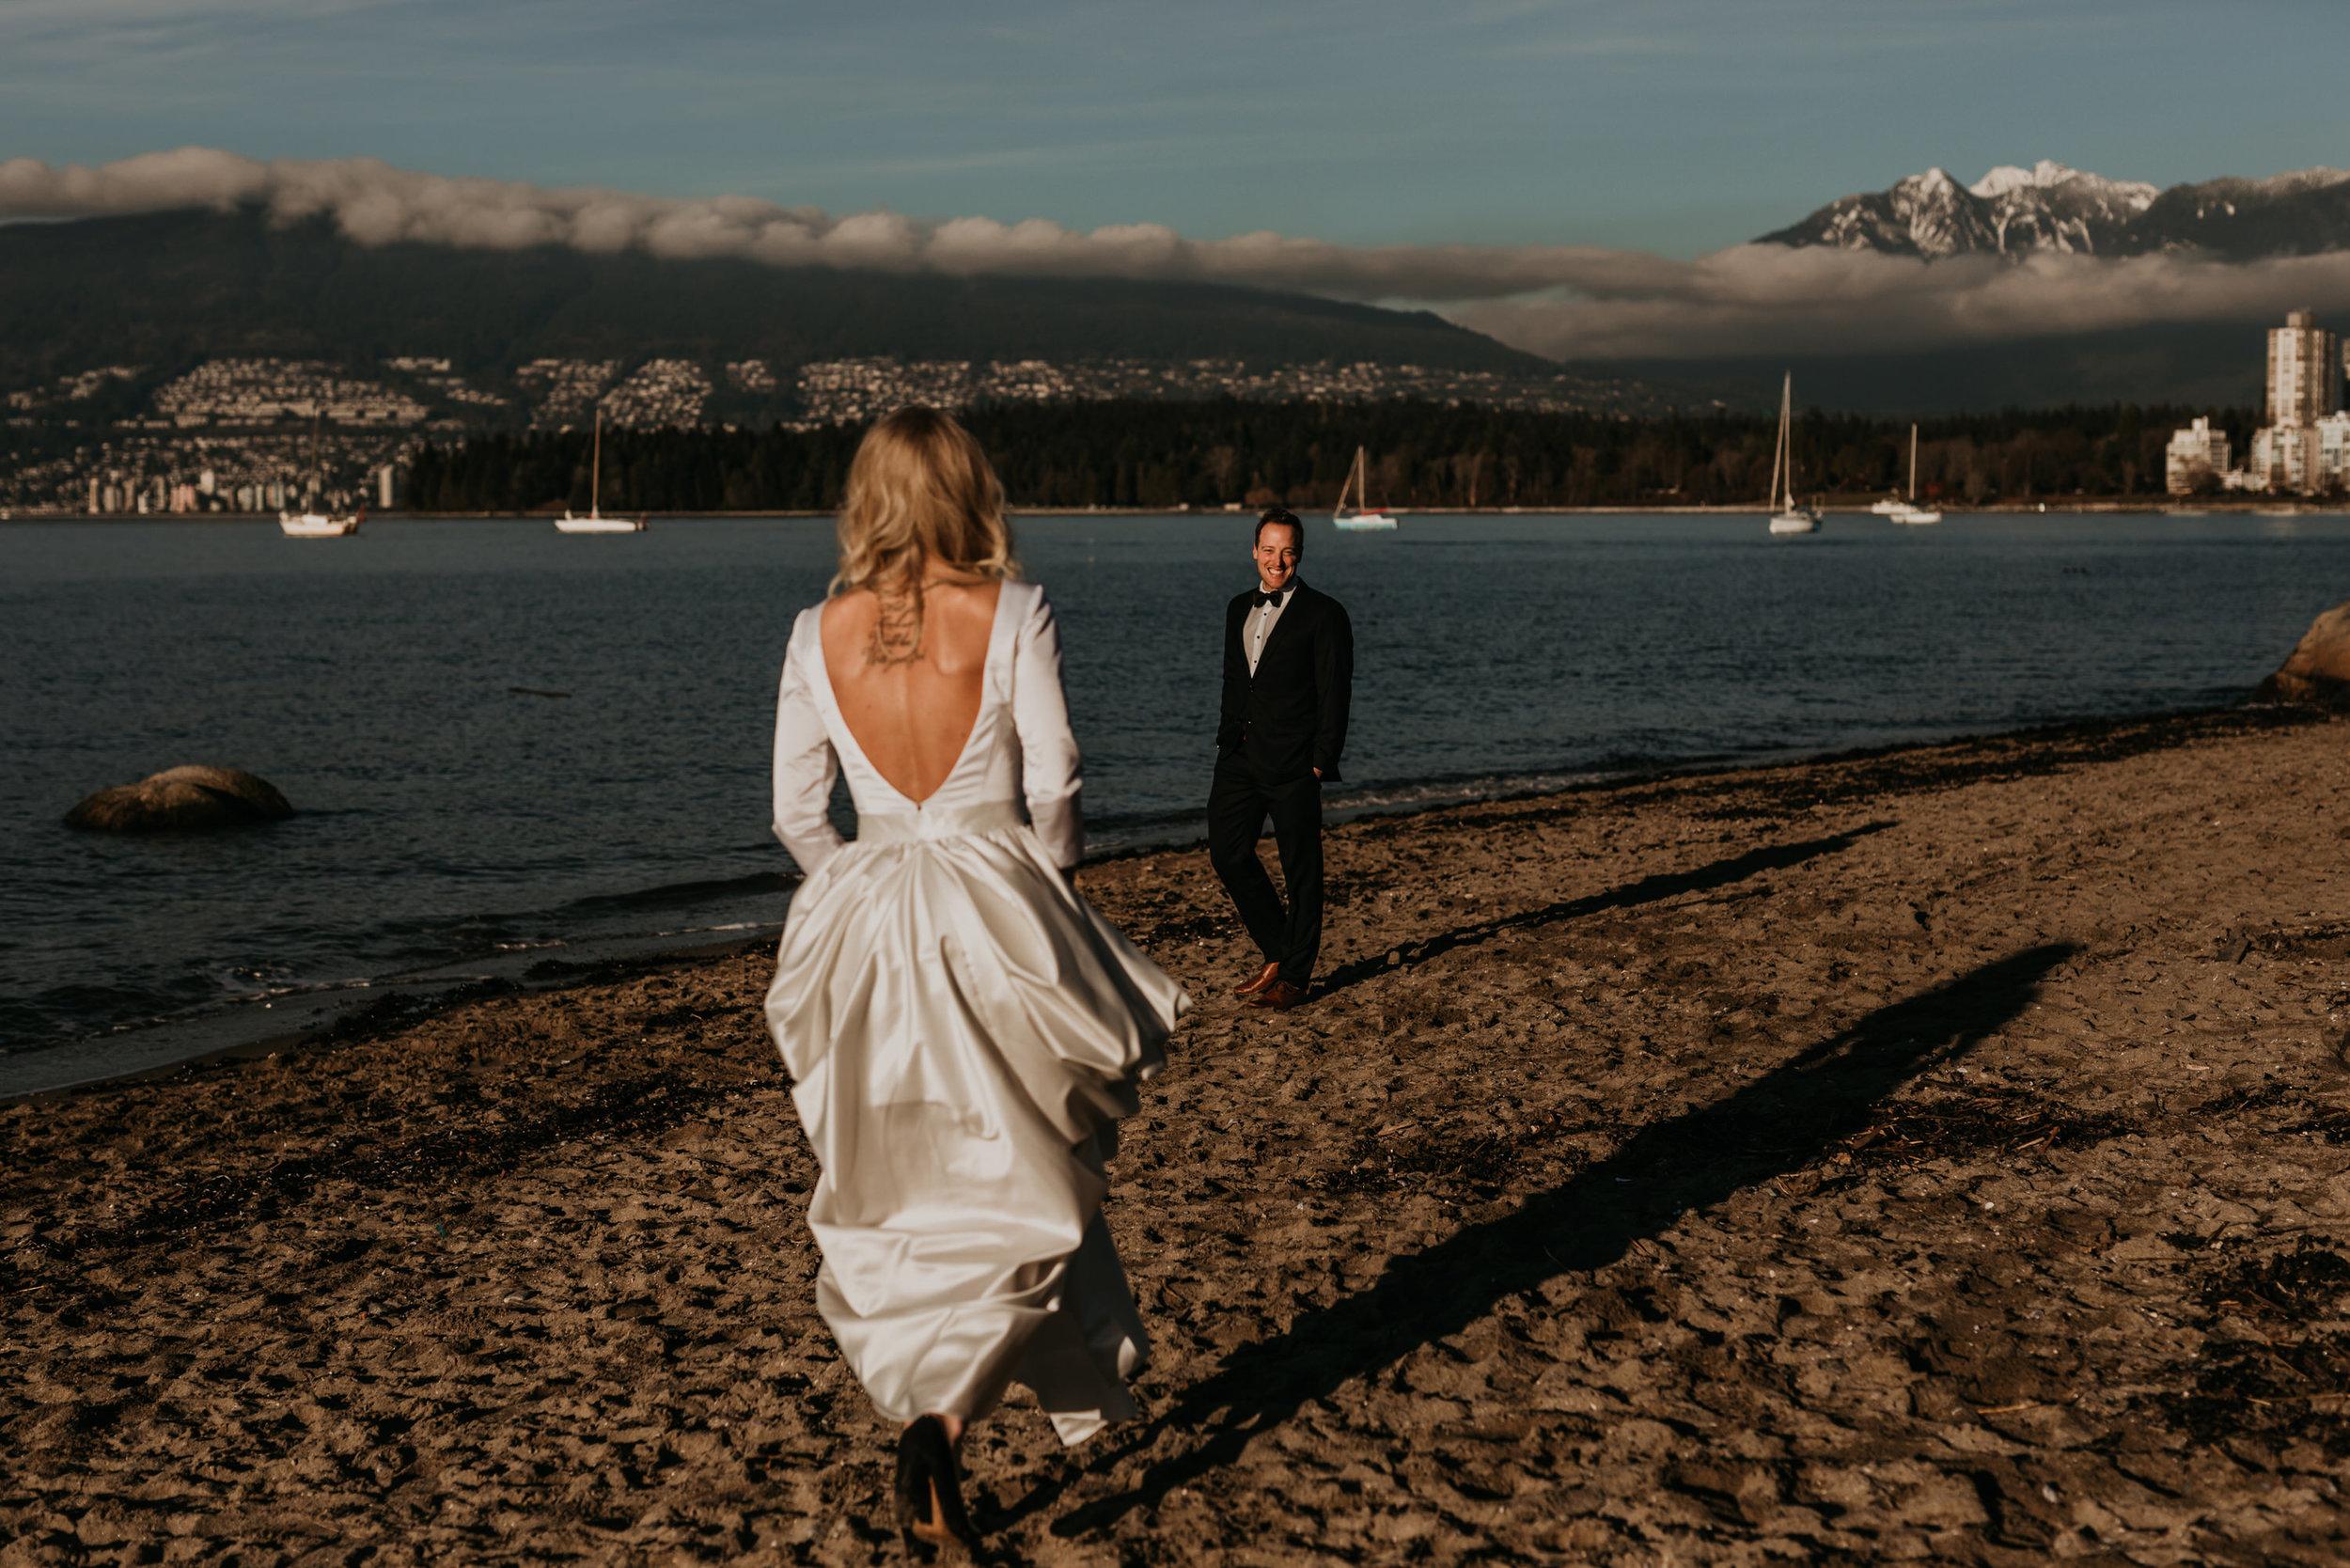 Vancouver Wedding Photos - Vegan Wedding Photographer - New Years Eve Wedding Photos - Vancouver Wedding Photographer - Vancouver Wedding Videographer - 599.JPG